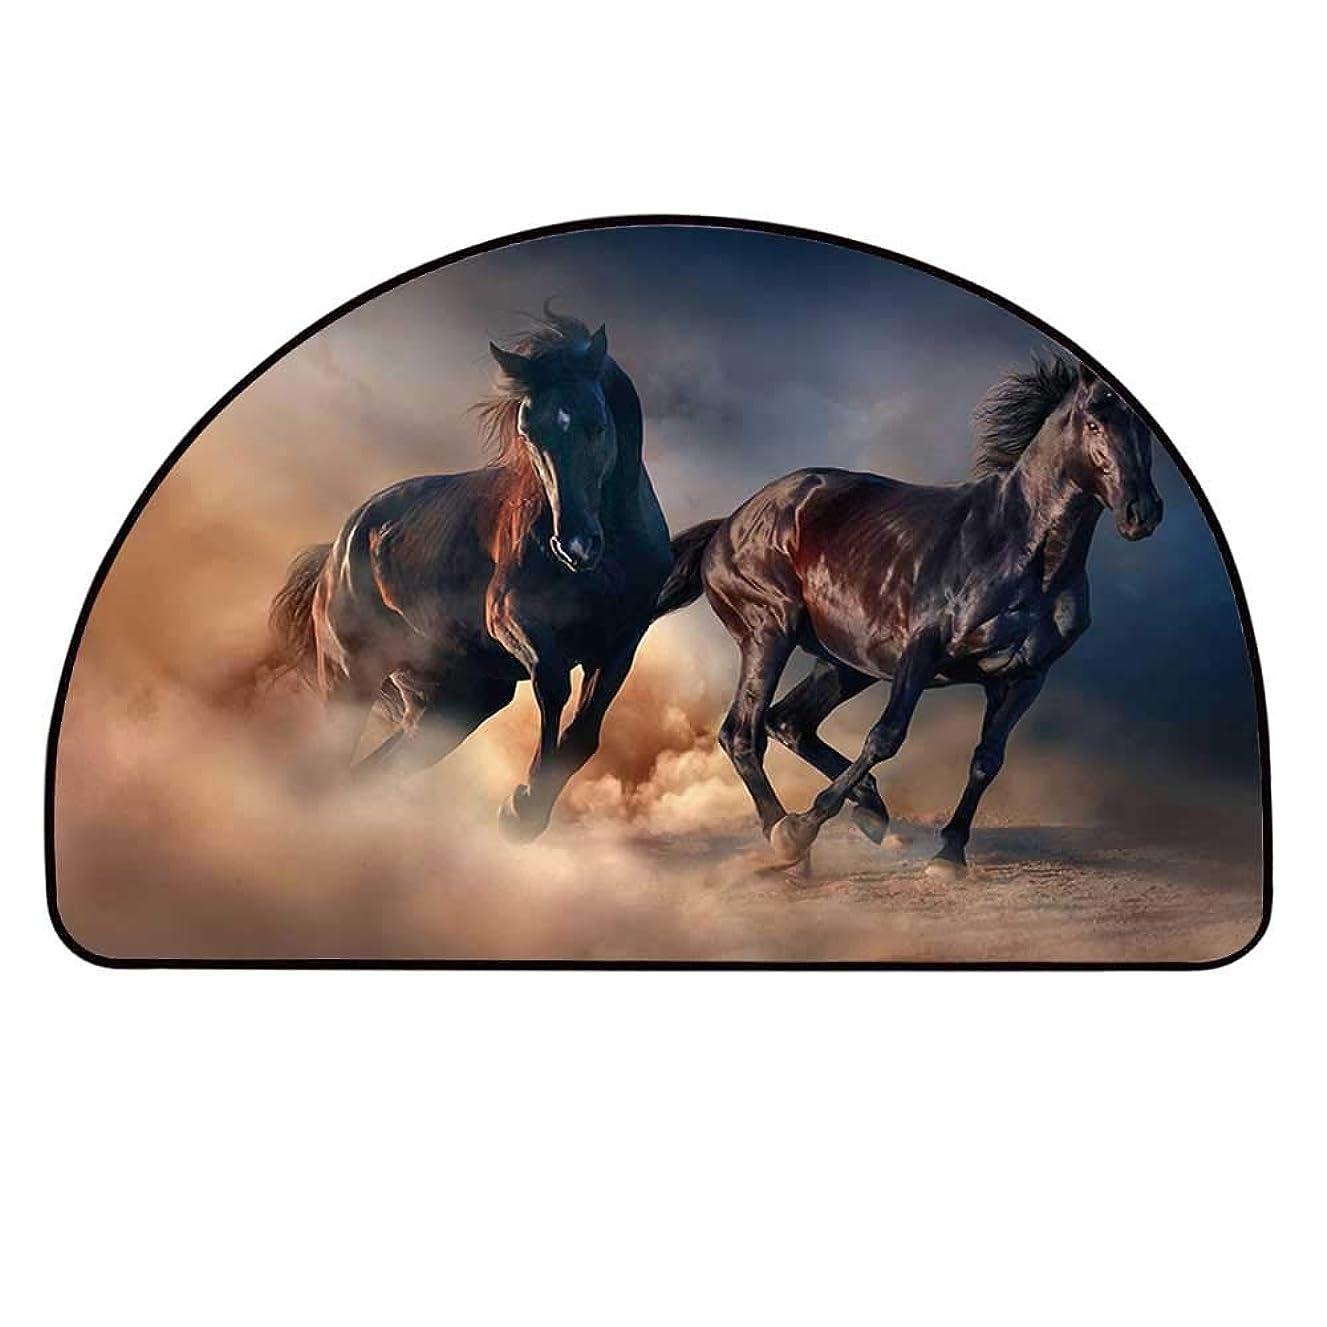 YOLIYANA Horse Decor Semicircle Rug,Two Black Stallions Run at Sunset in Desert Dust Equestrian Image Decorative Floor Mat,11.8